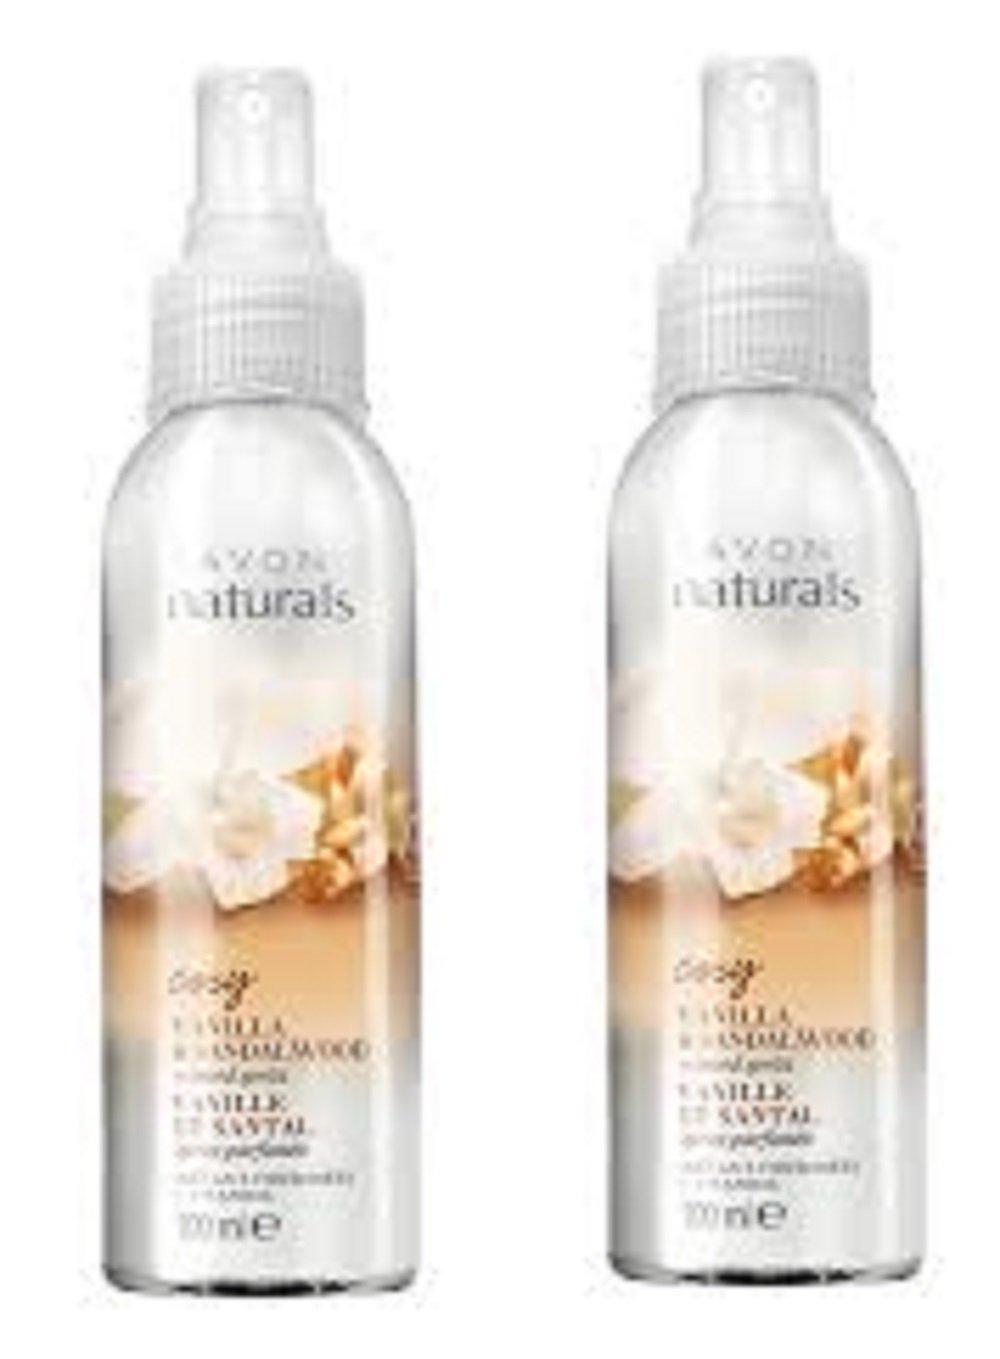 2 x Avon Naturals Vanilla and Sandalwood scented Spritz - 100ml